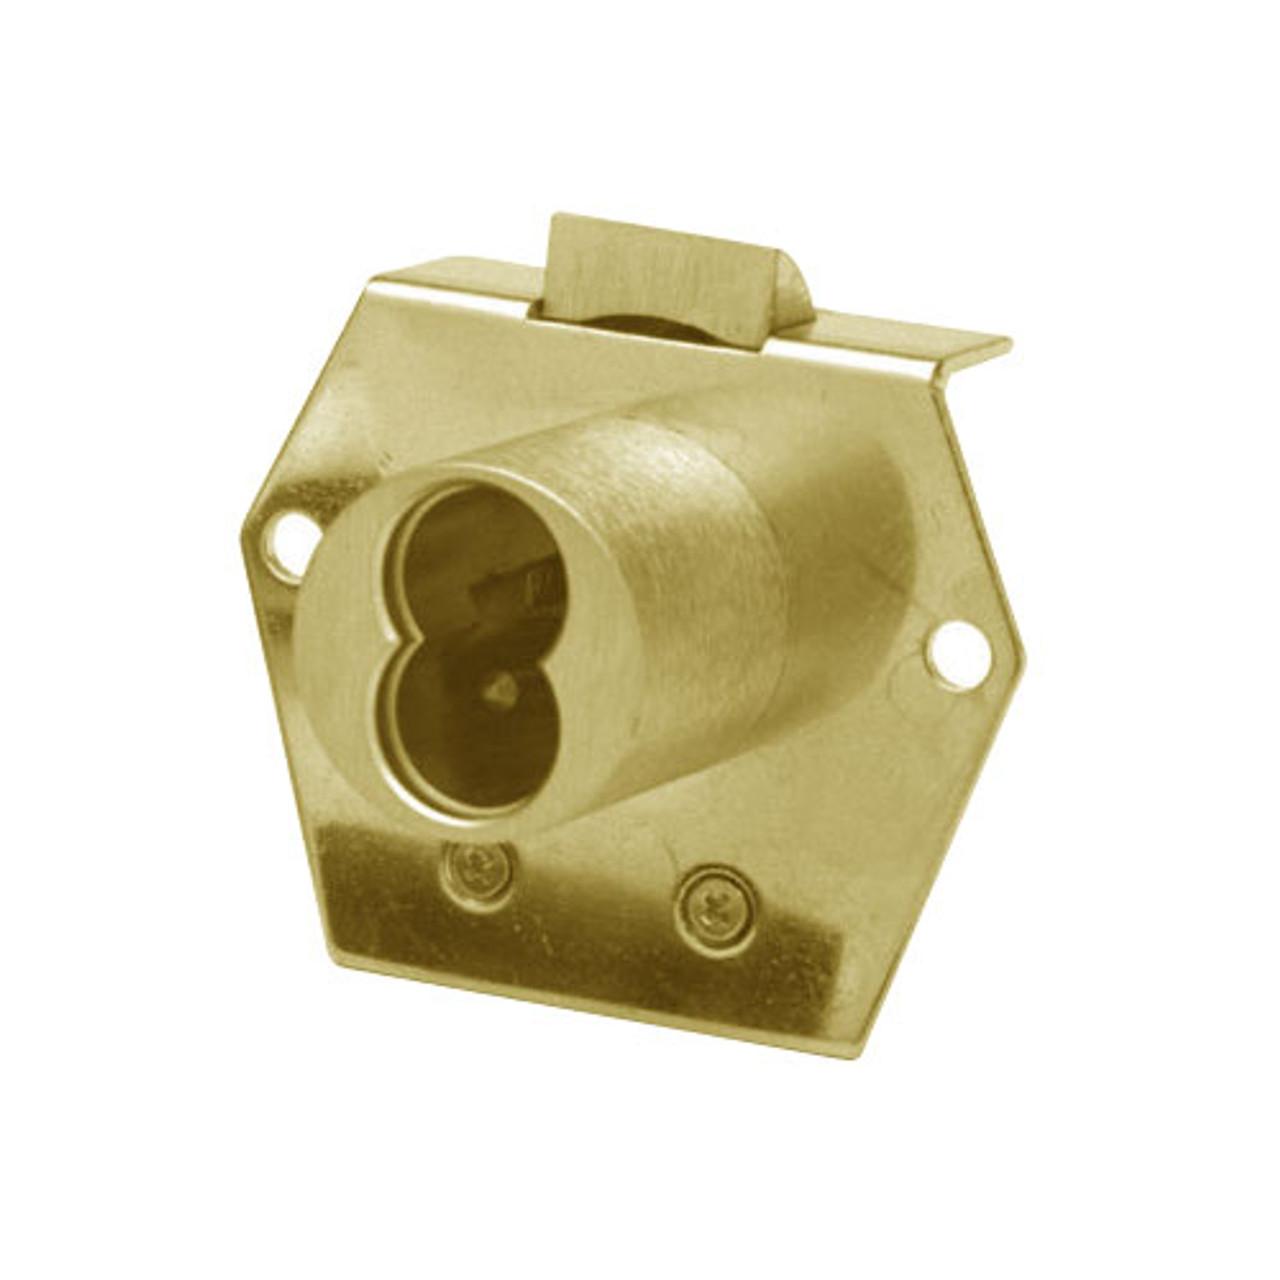 Olympus 725RL-DW-VH-US3 Cabinet Locks in Bright Brass Finish